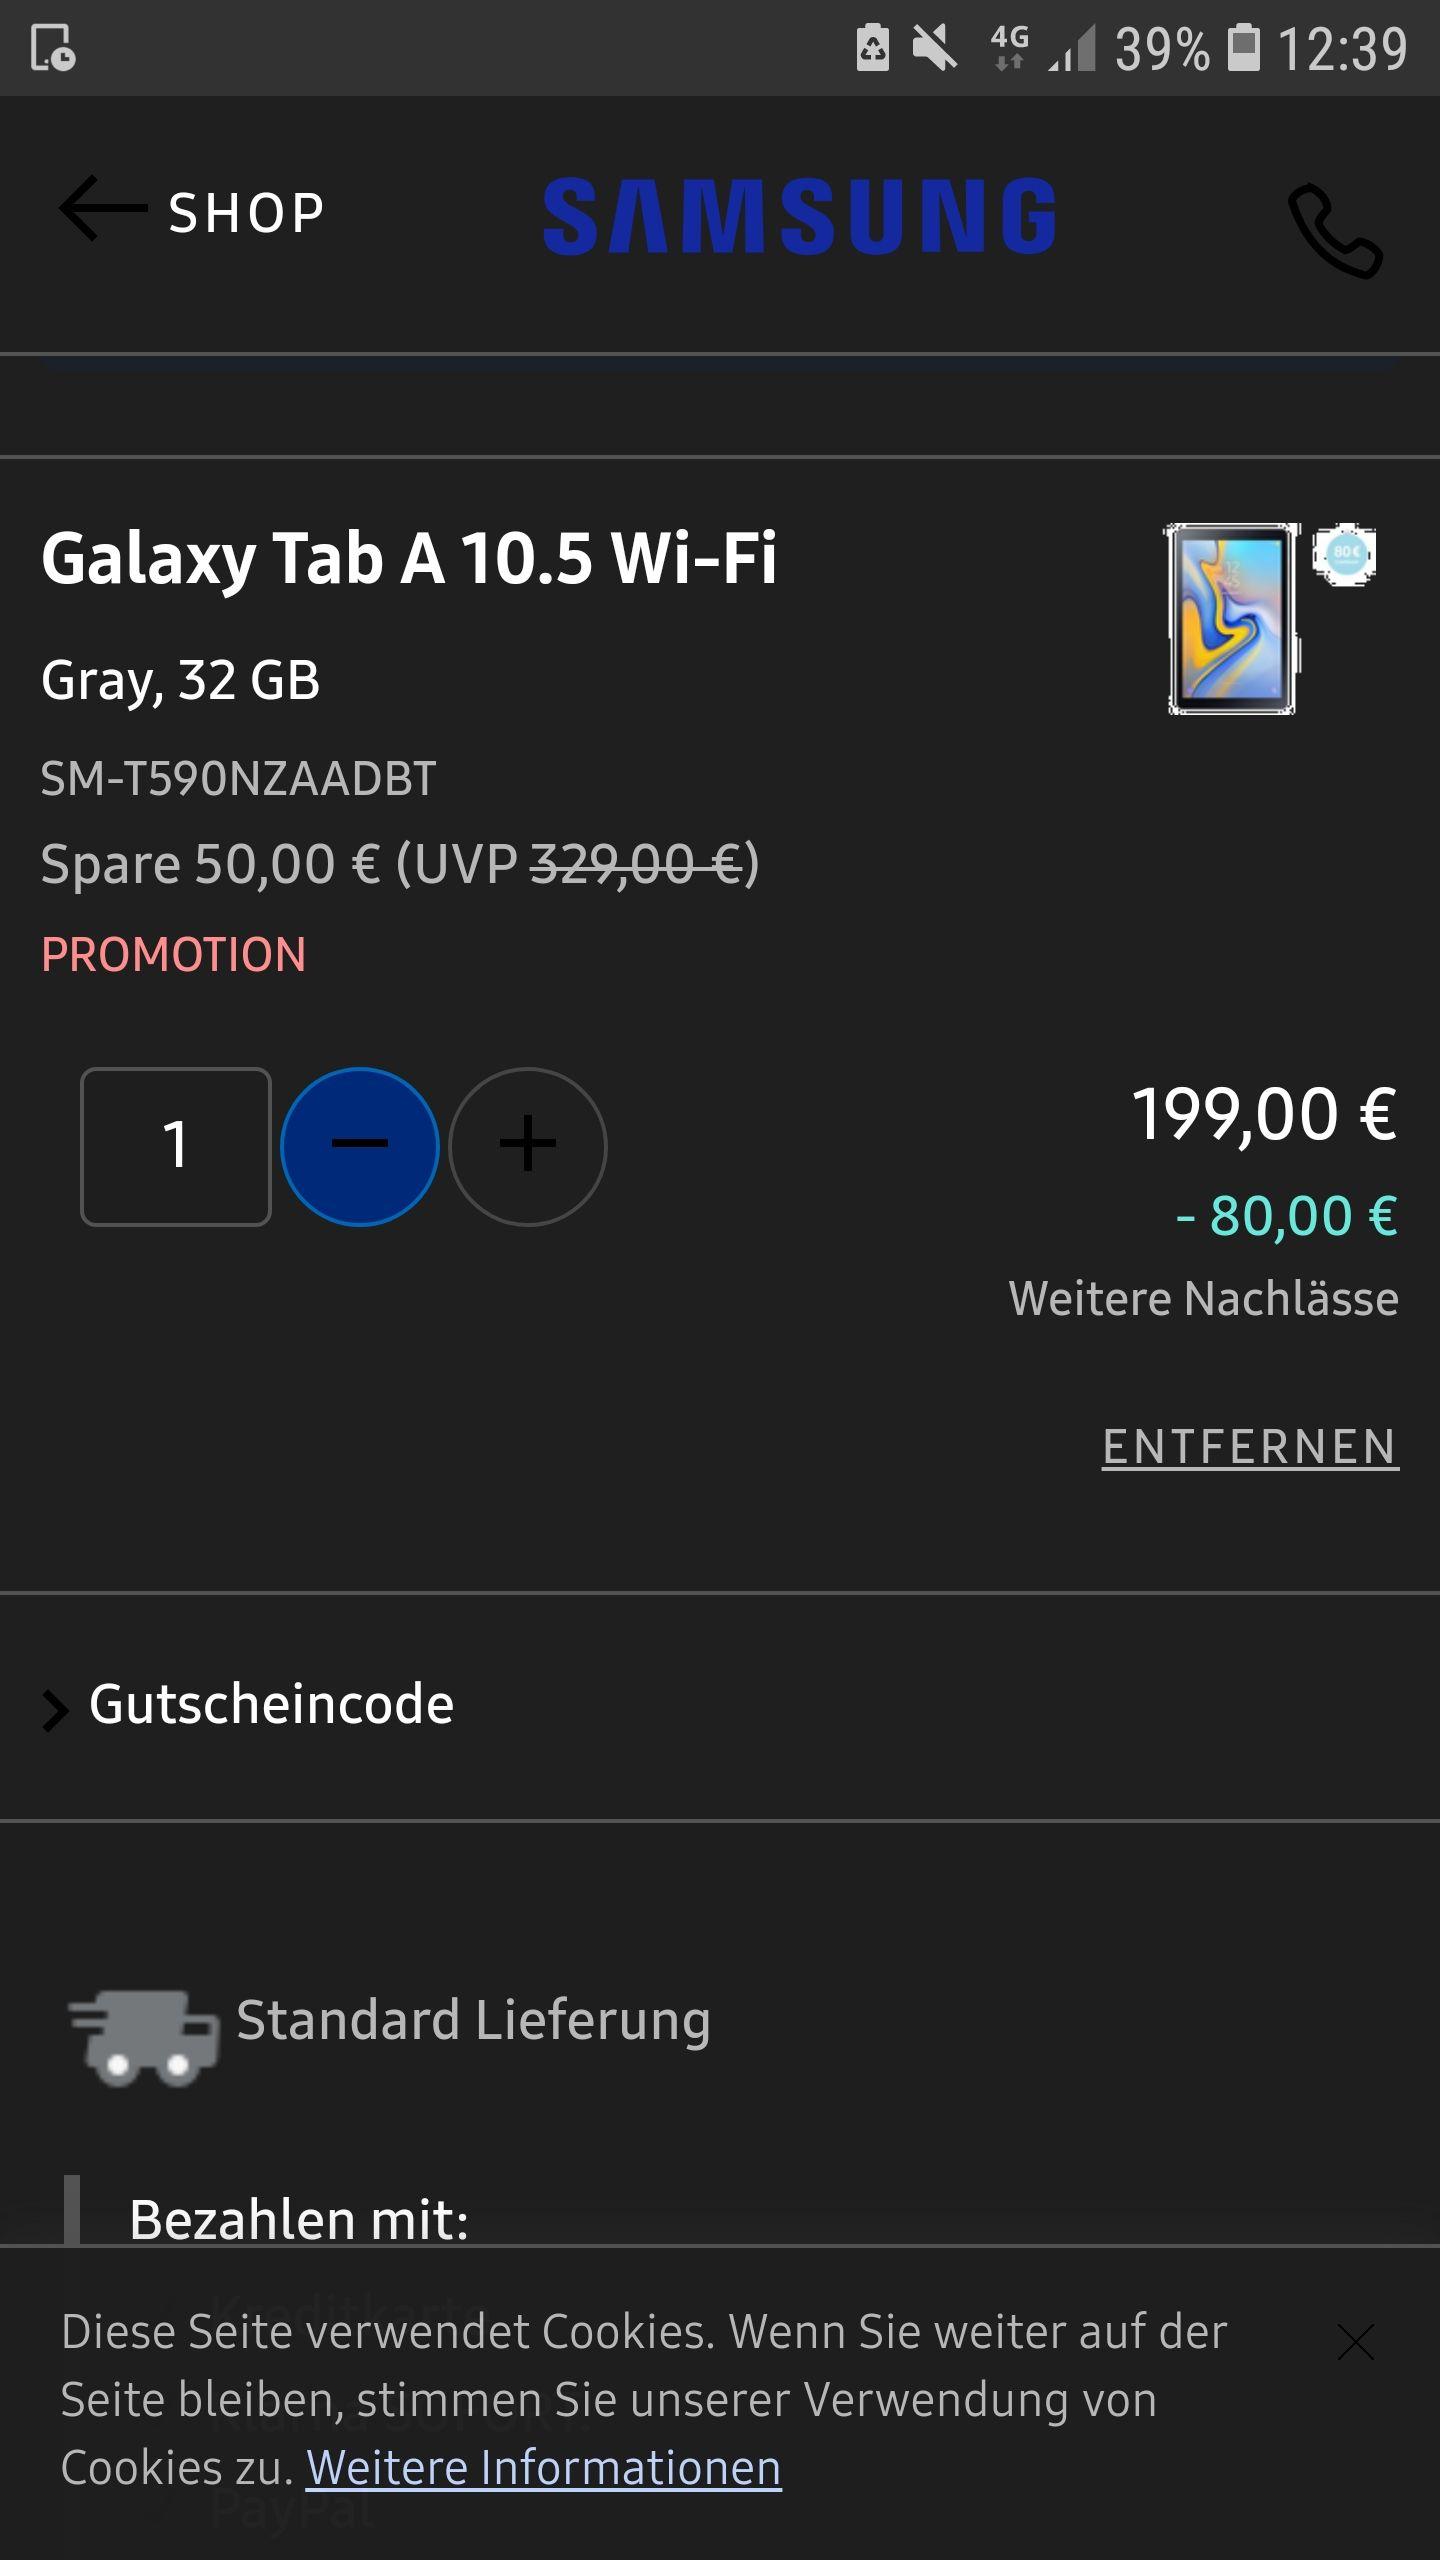 Samsung SM-T590 Galaxy Tab A 10.5 Wi-Fi Tablet-PC (Snapdragon 450, 3GB RAM, Android 8.1) Grau